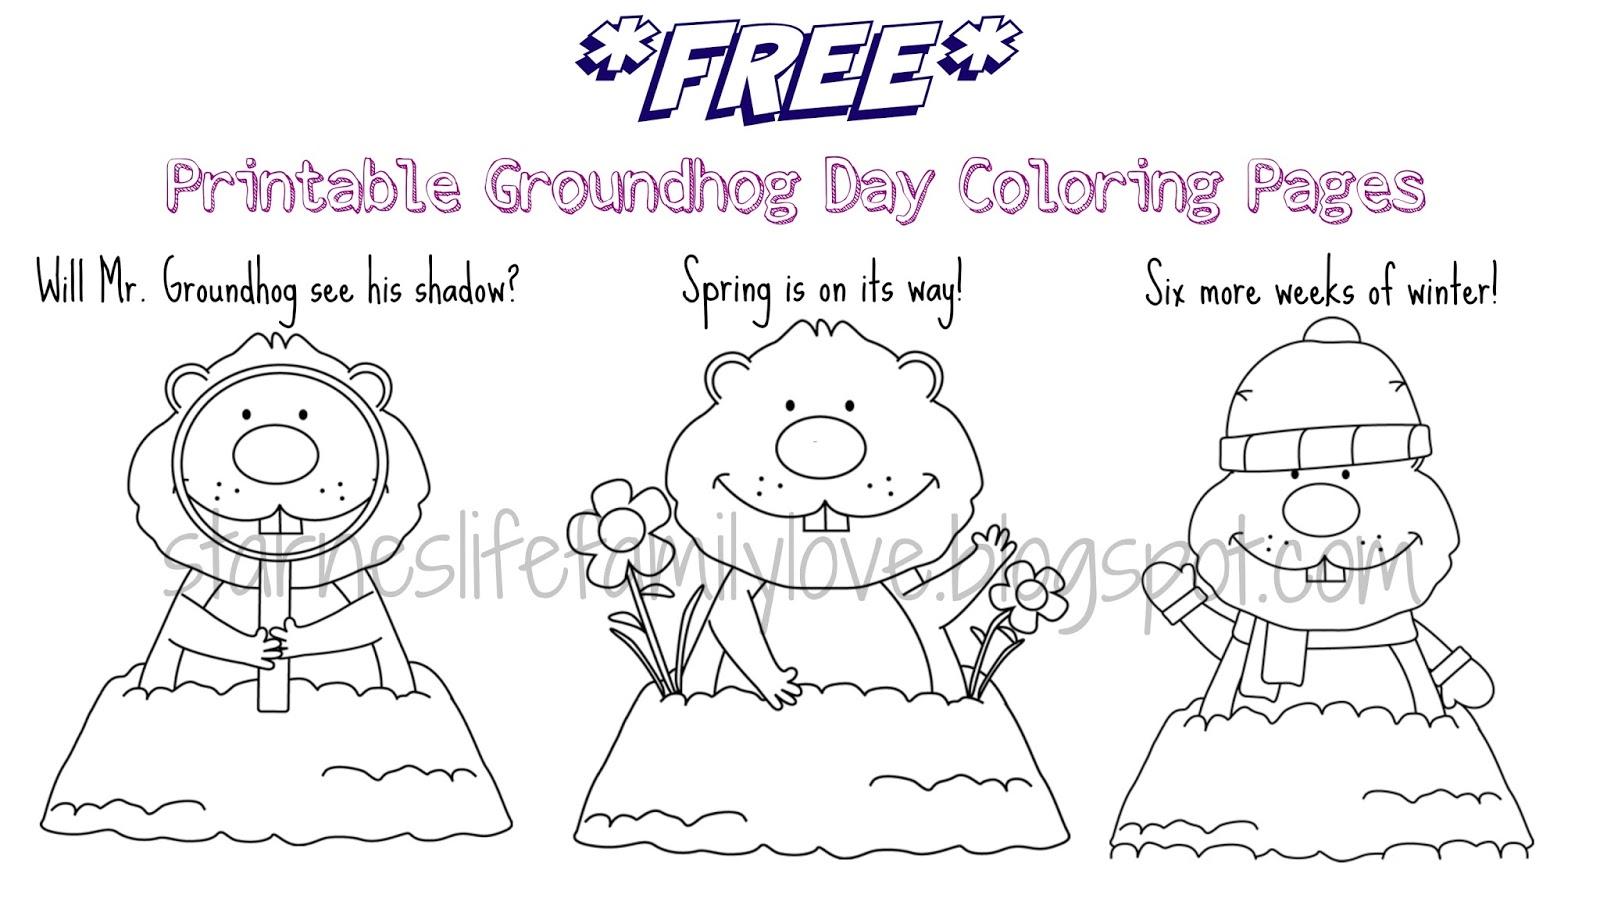 Life. Family. Love.: Groundhog Day Fun Plus *FREE* Printables